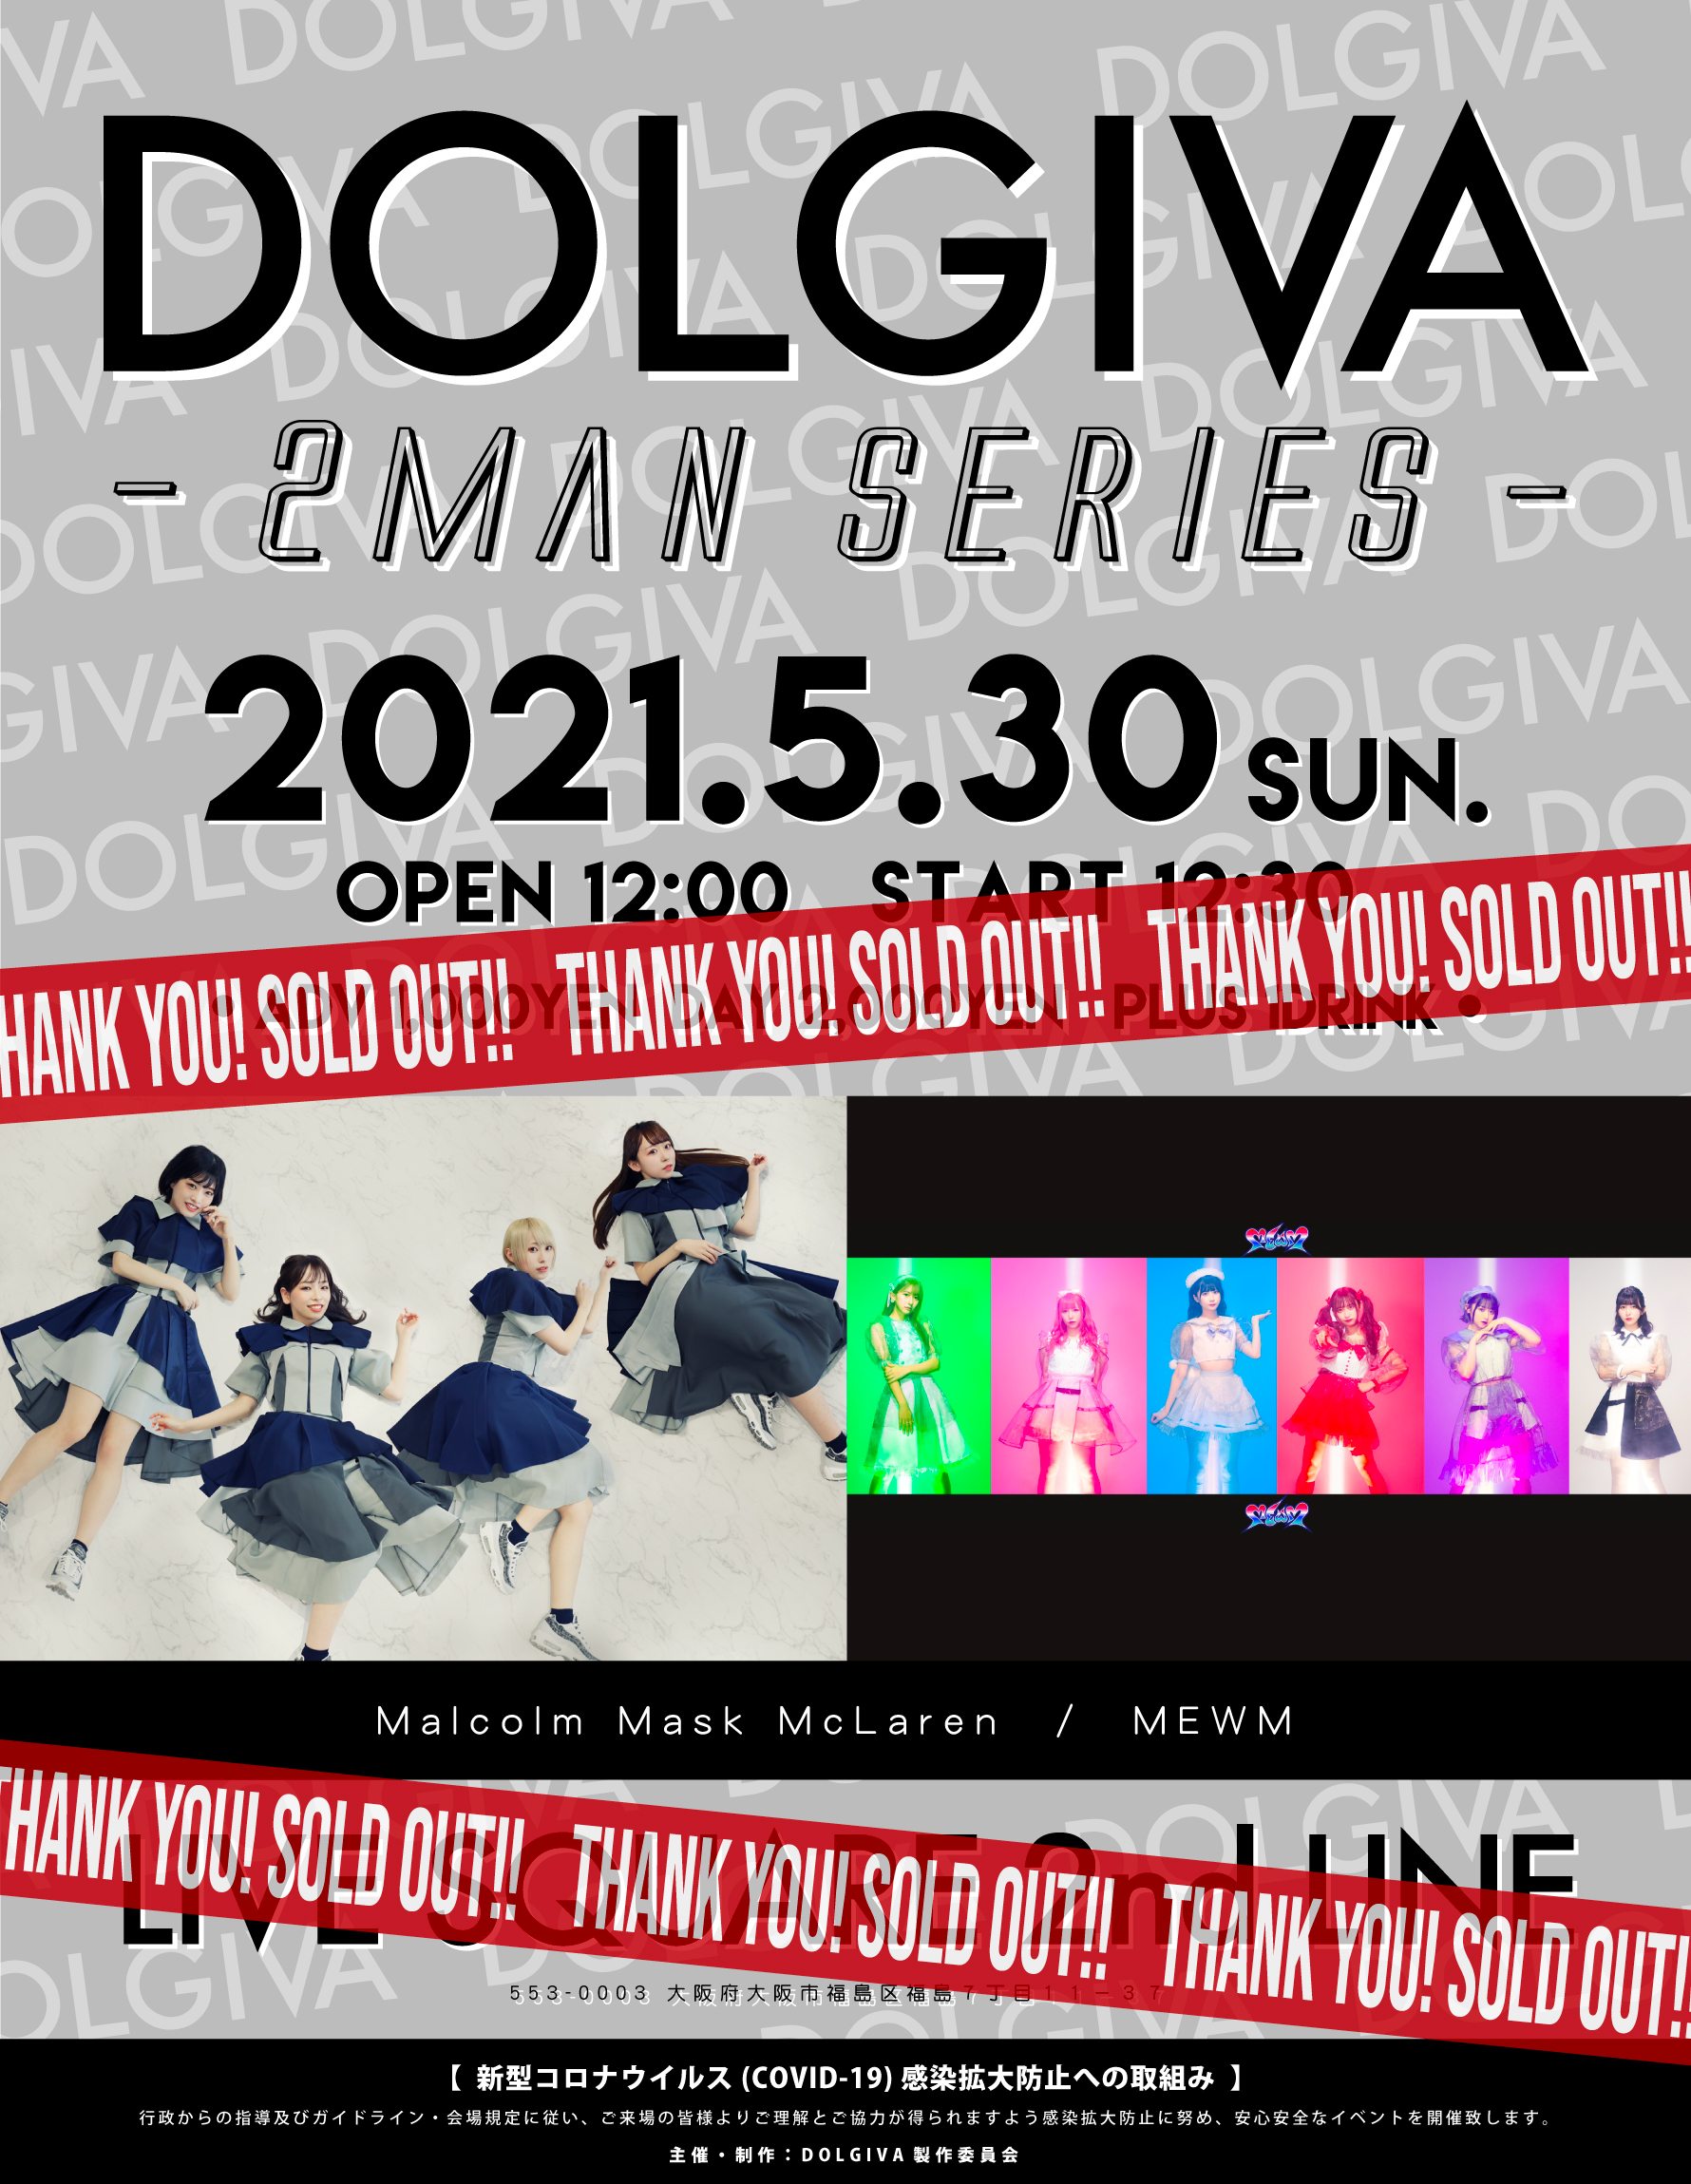 「DOLGIVA - 2man series」